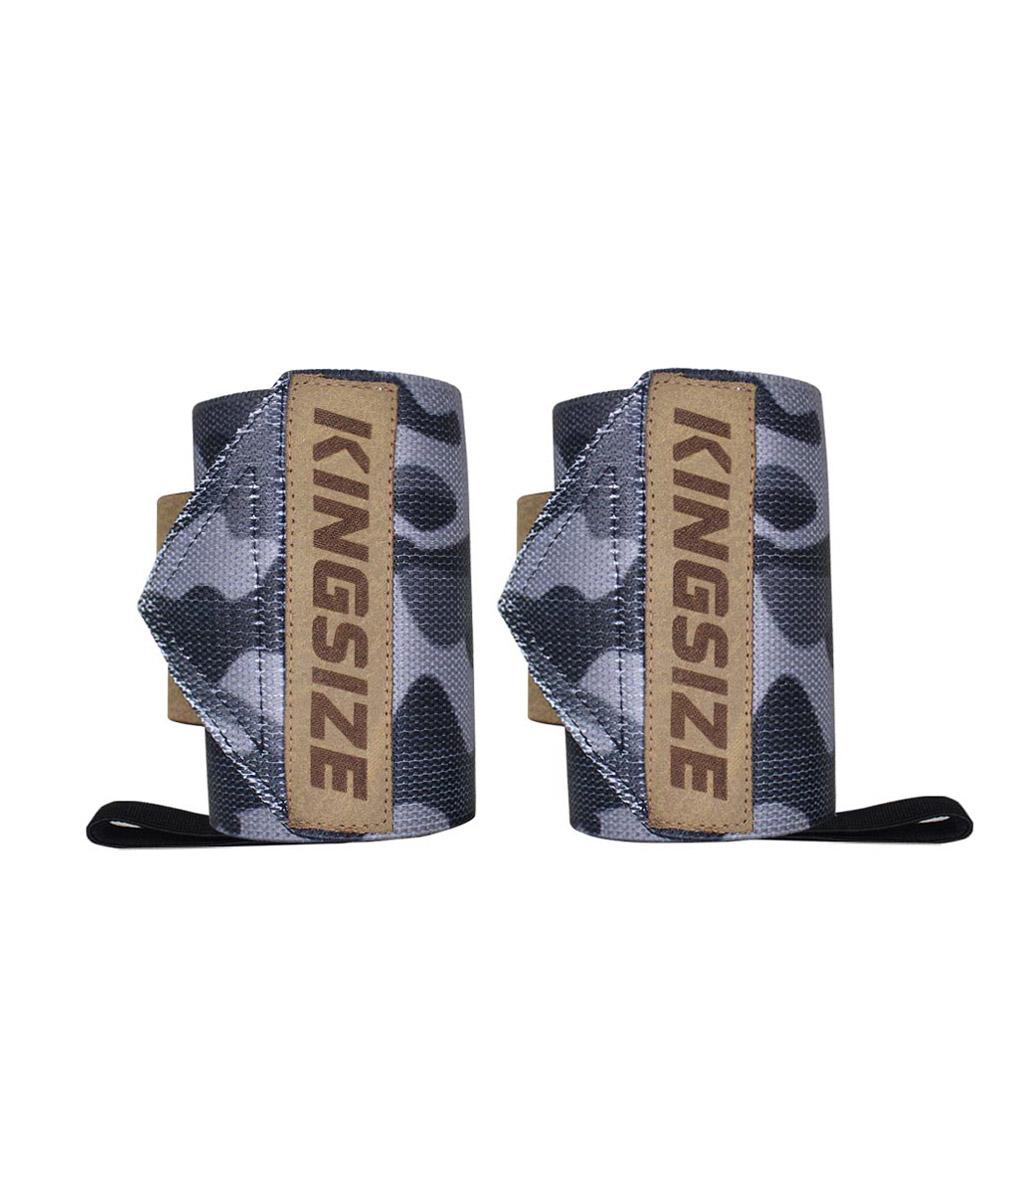 Kingsize Heavy Duty Wrist Wraps XL